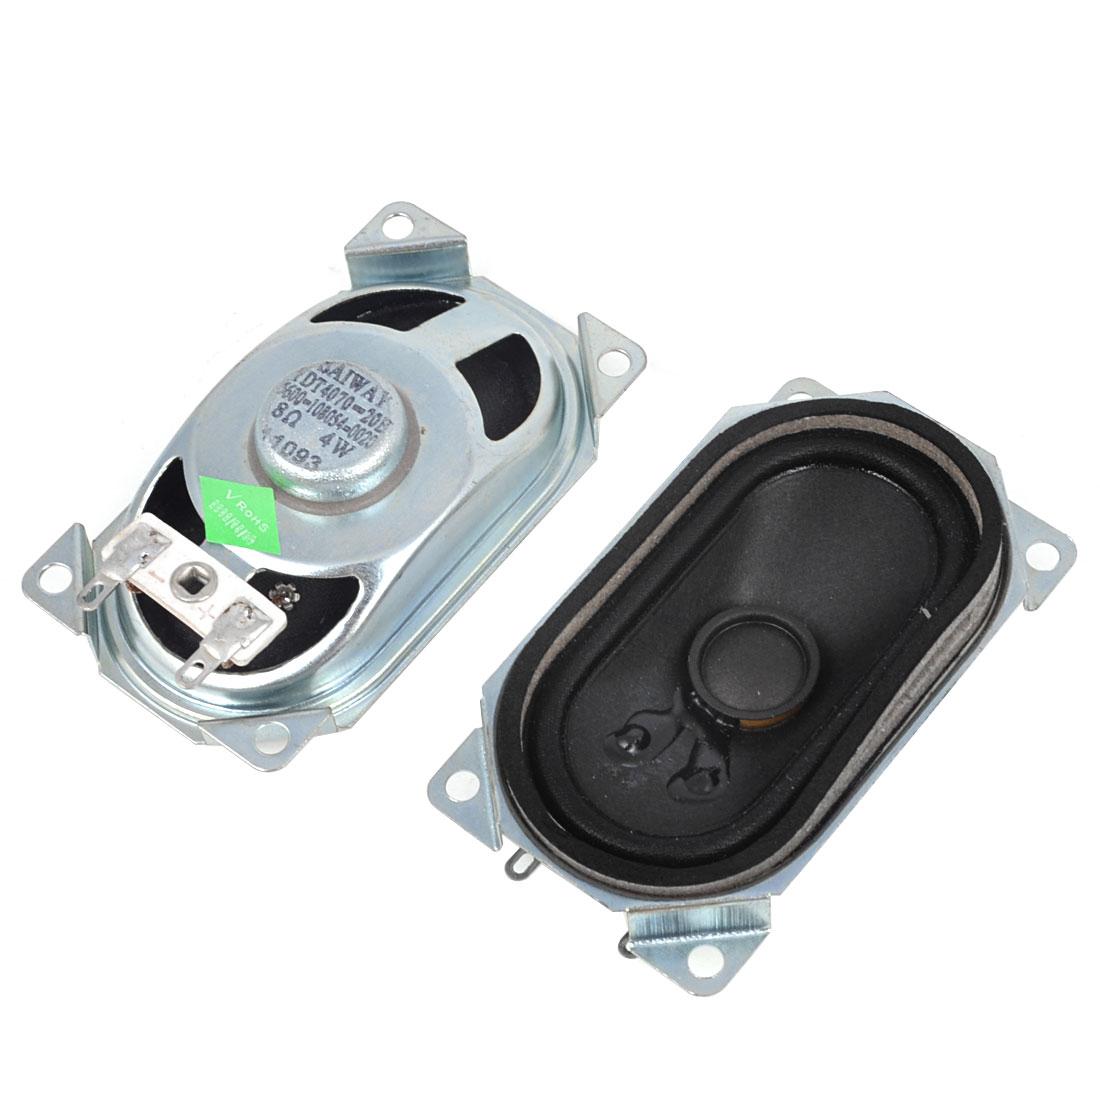 "2pcs 4W 8 Ohm 2.8"" x 1.7"" Aluminum Housing Rectangular Internal Magnet Speaker"